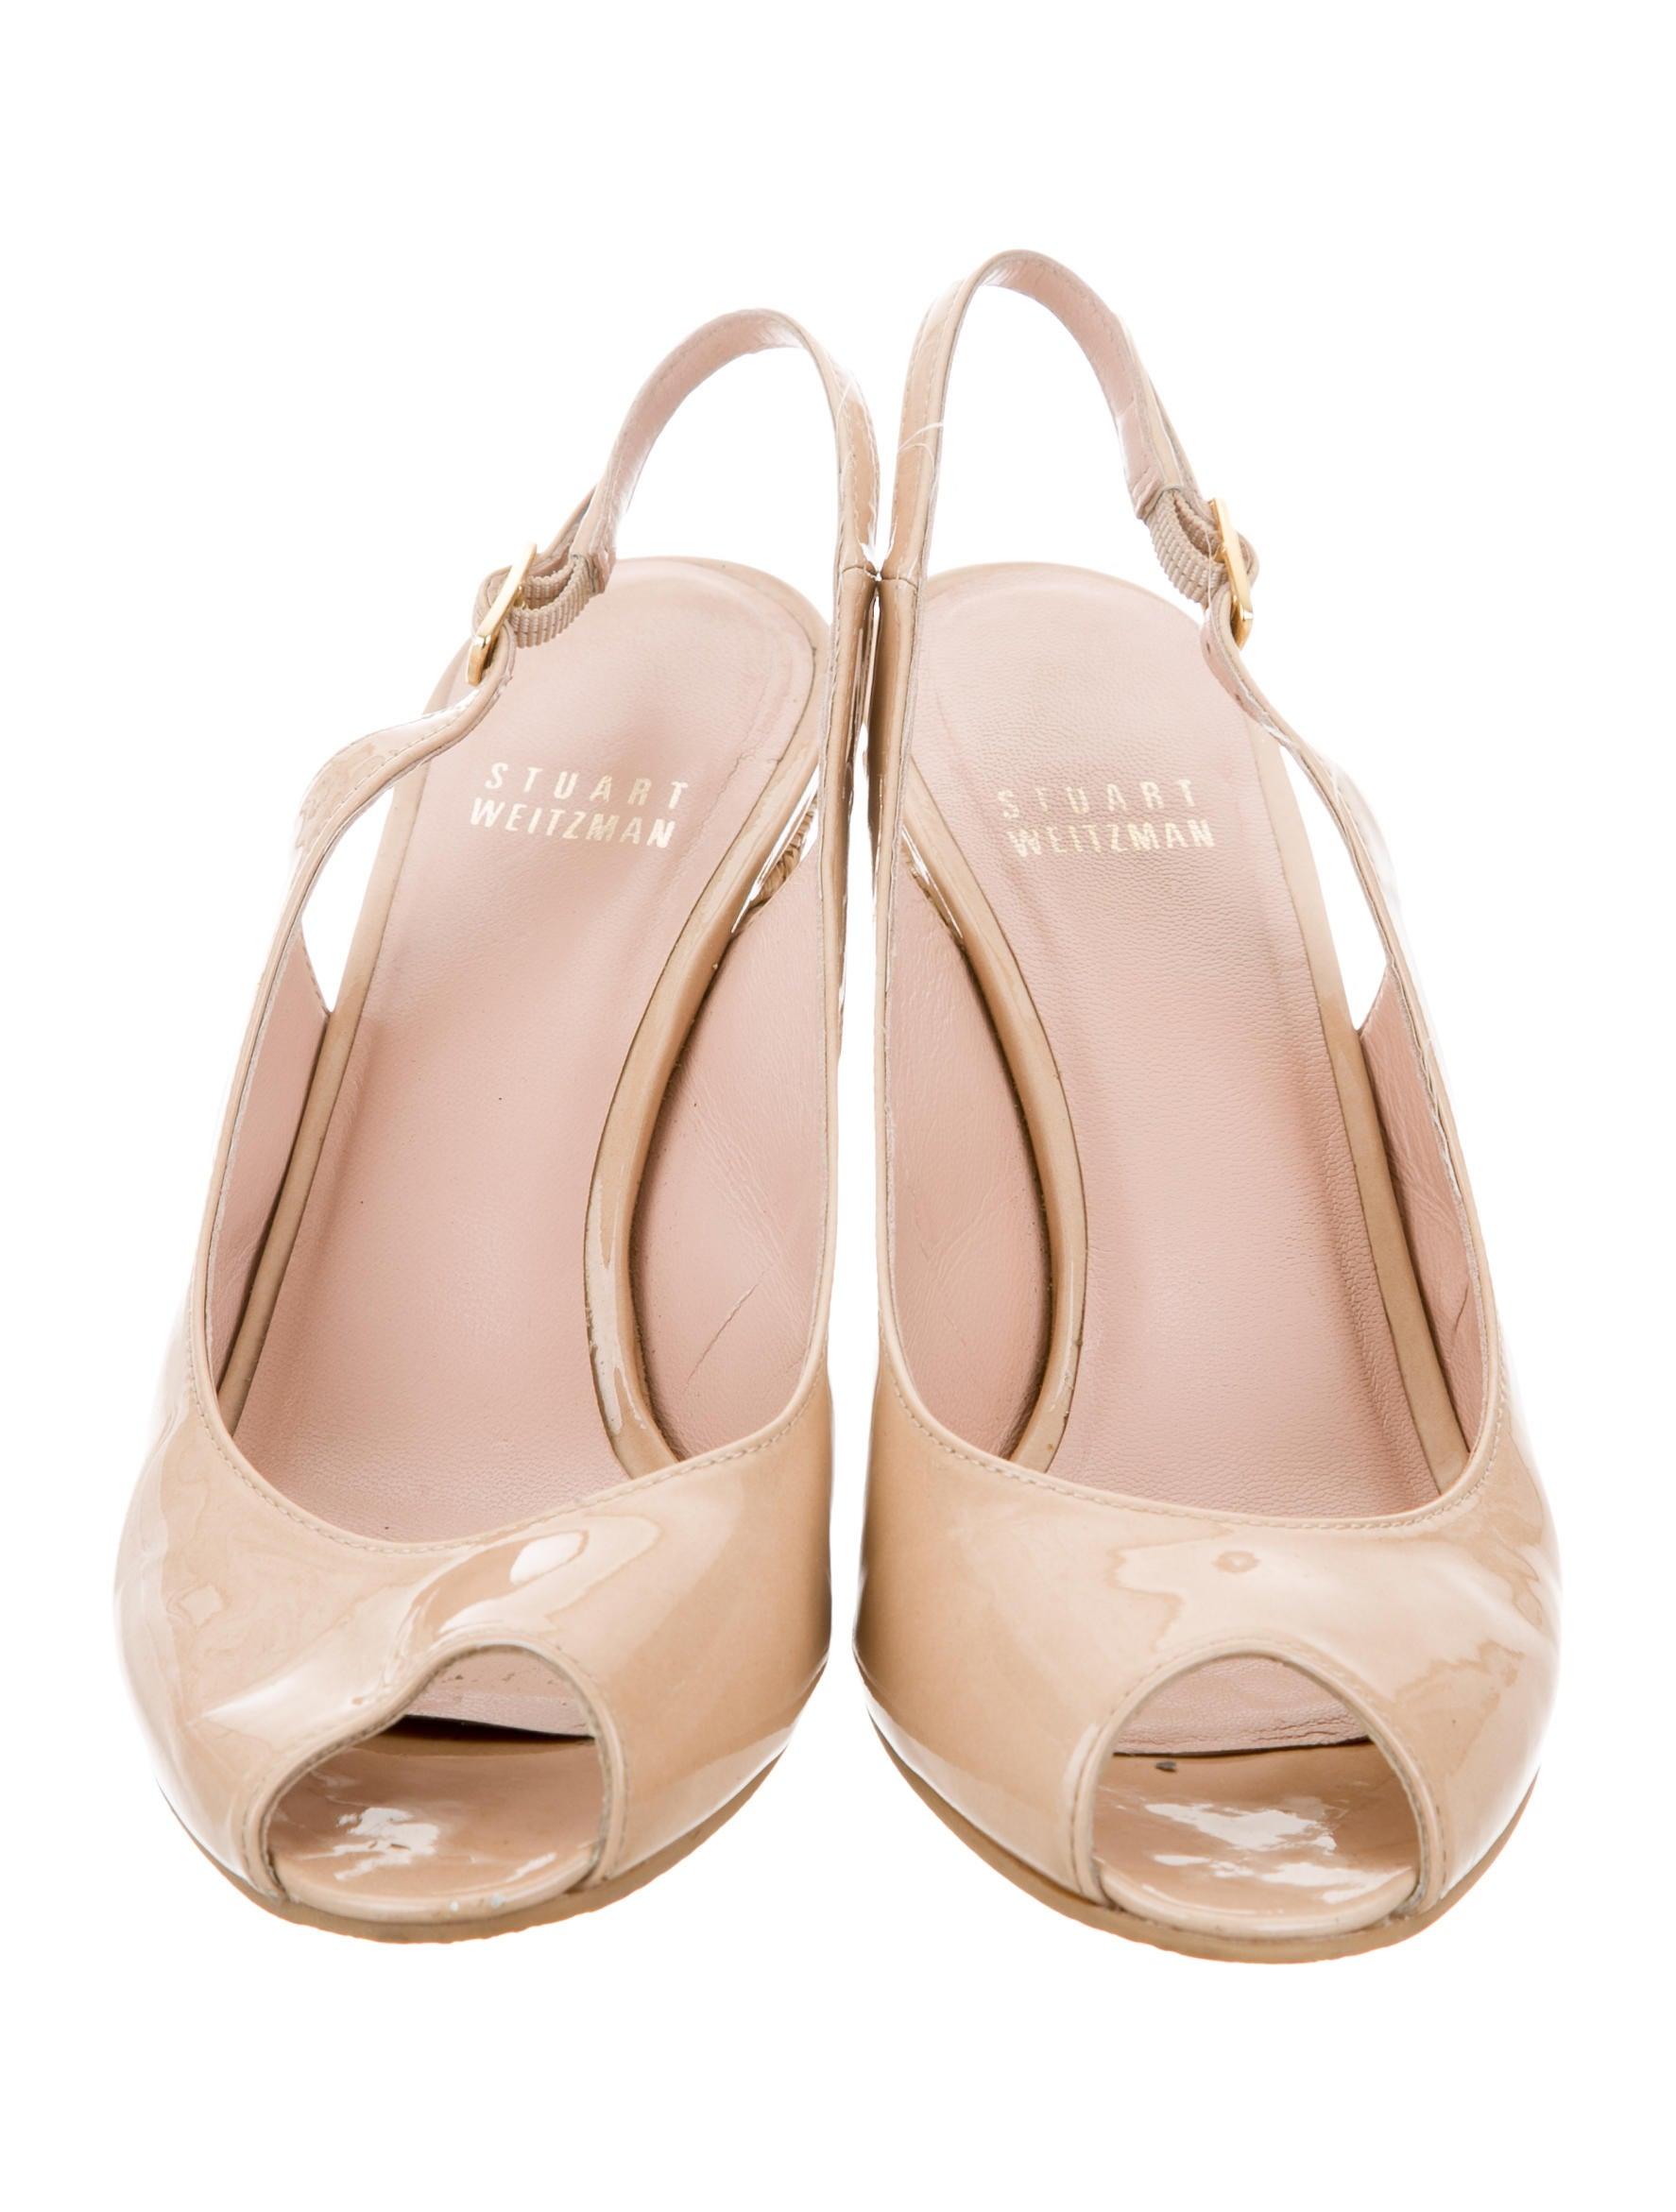 stuart weitzman slingback espadrille wedges shoes